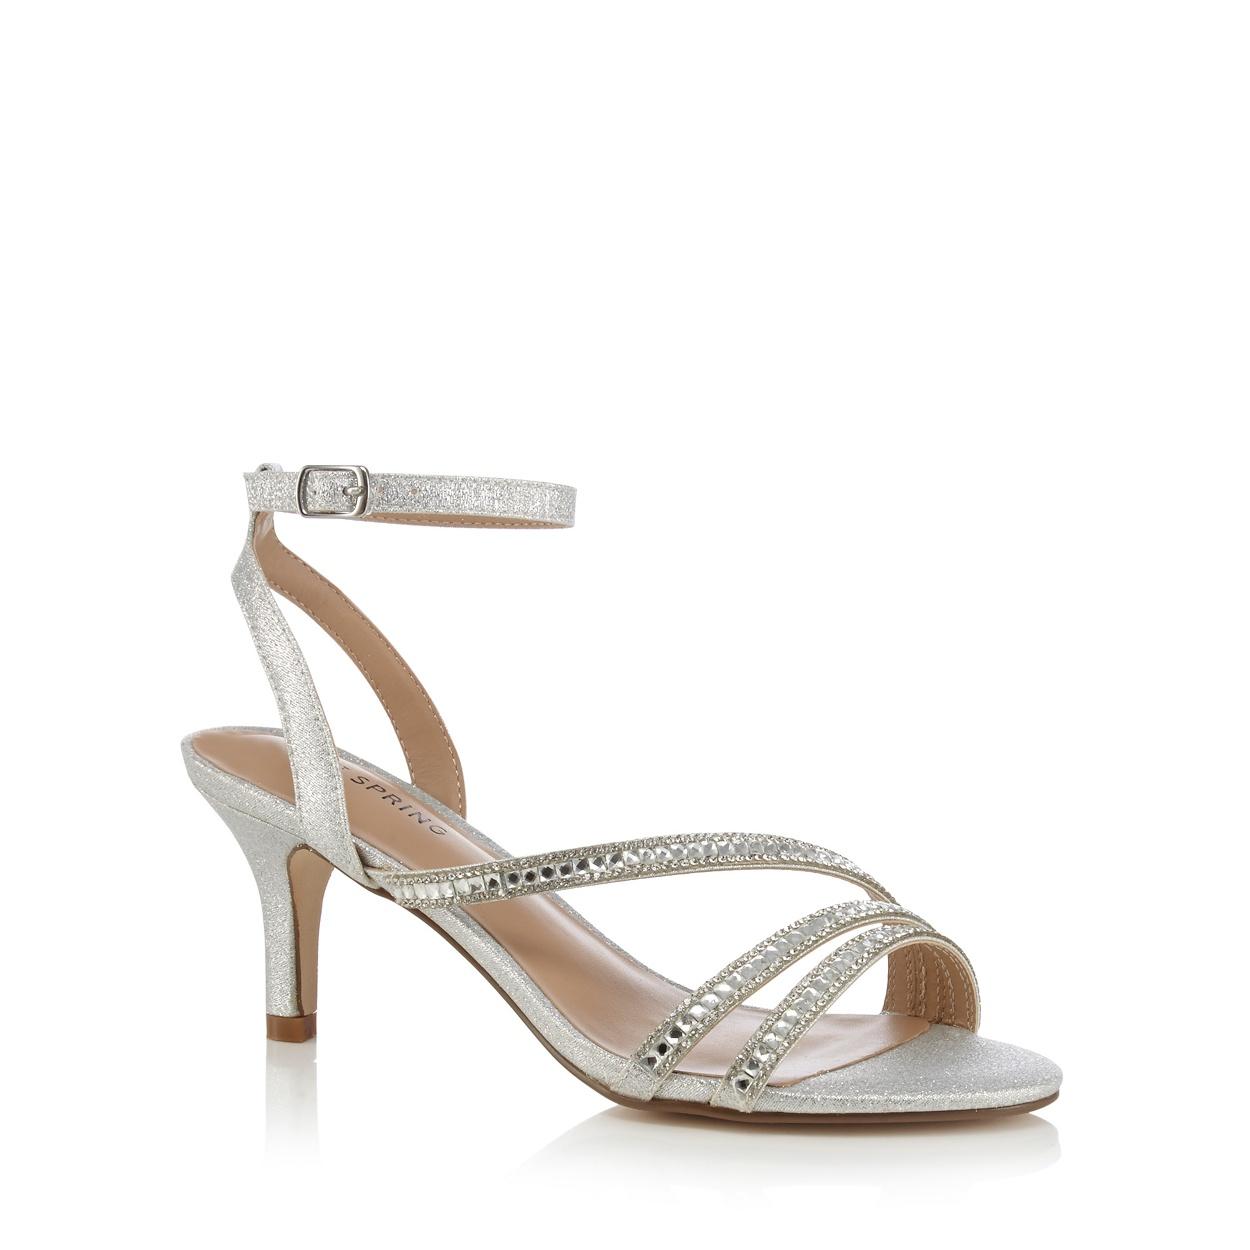 Black sandals debenhams - Call It Spring Silver Glerawiel High Stiletto Heel Ankle Strap Sandals